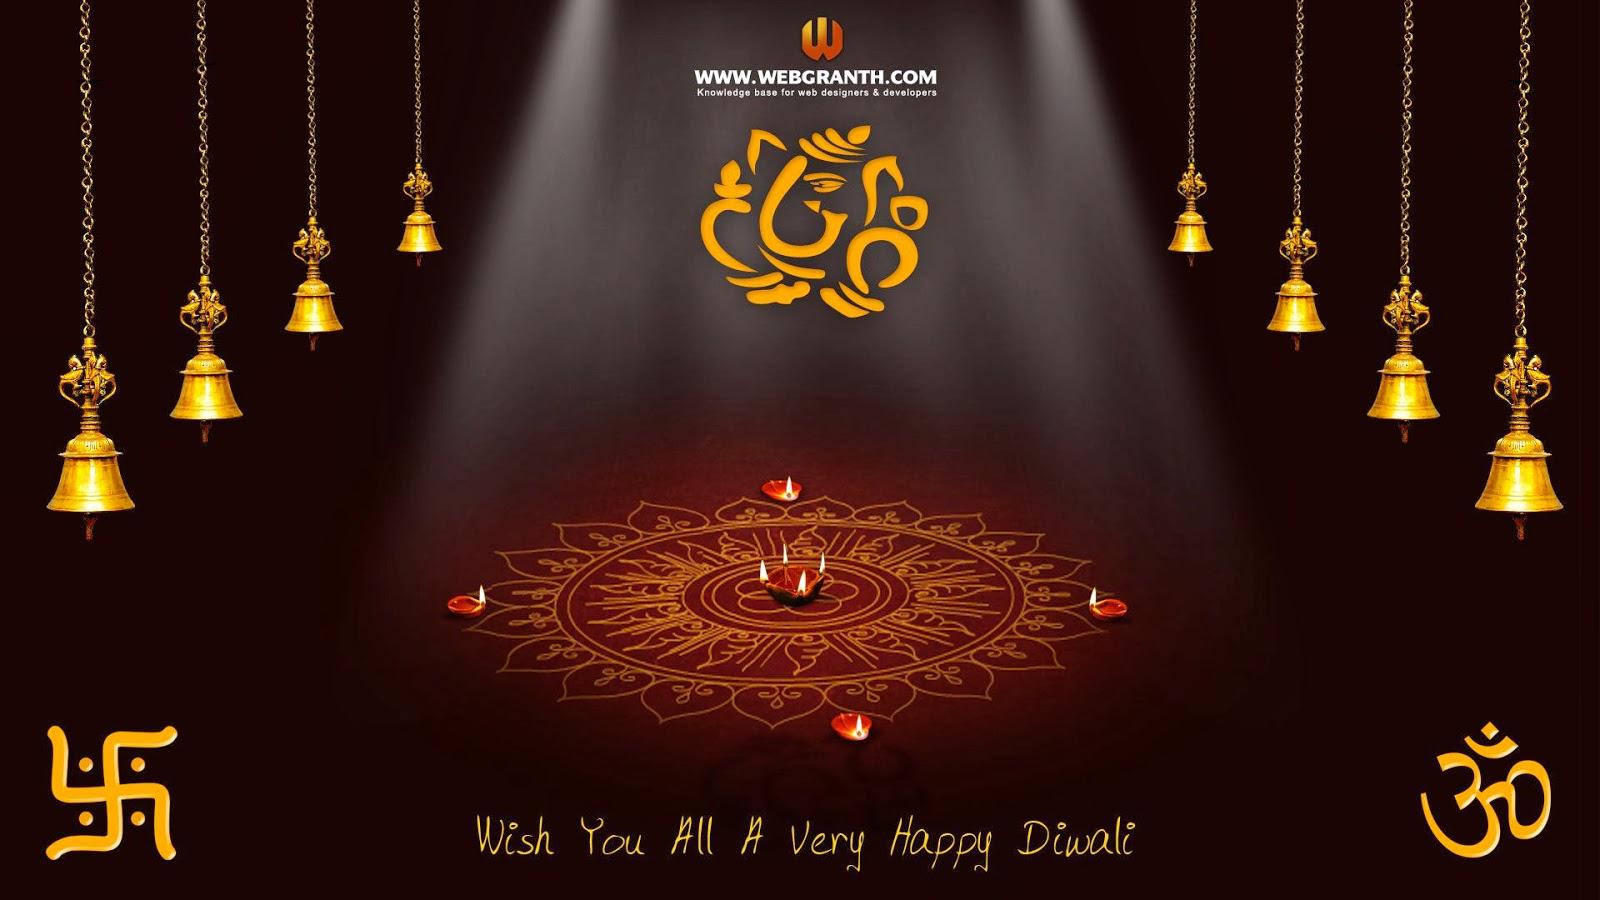 cgfrog beautiful diwali greeting card designs and